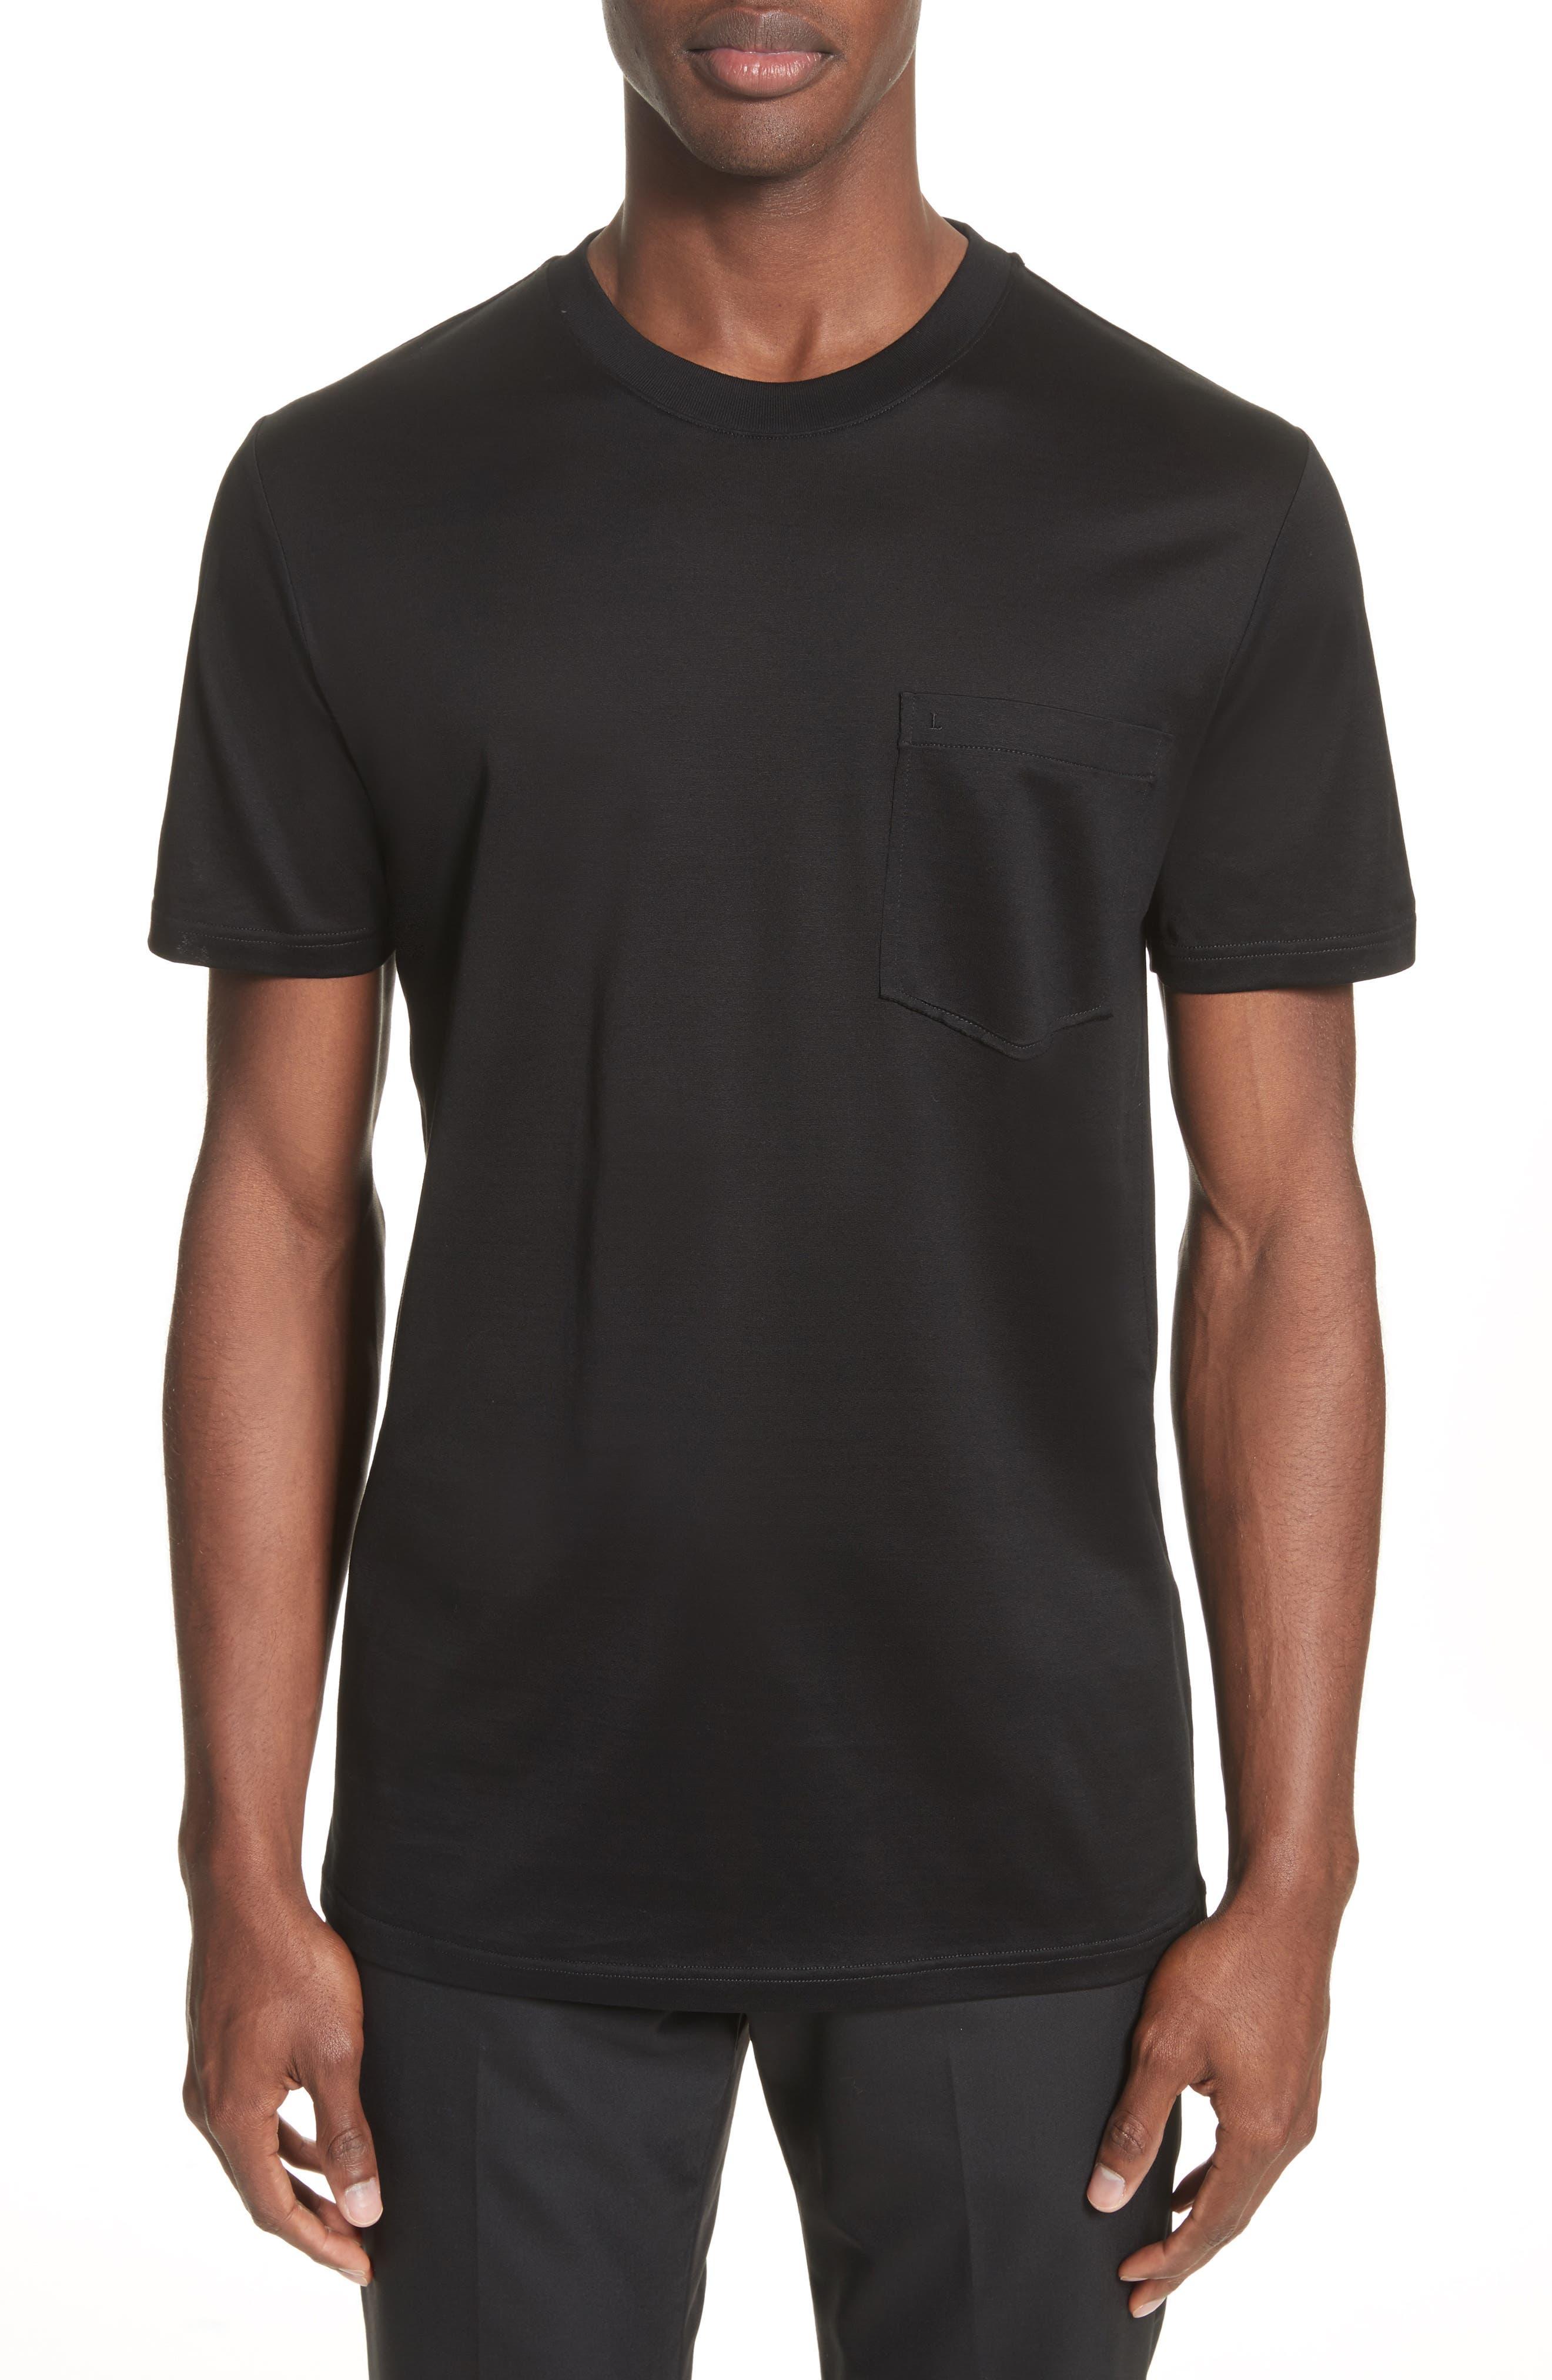 L Pocket T-Shirt,                             Main thumbnail 1, color,                             001